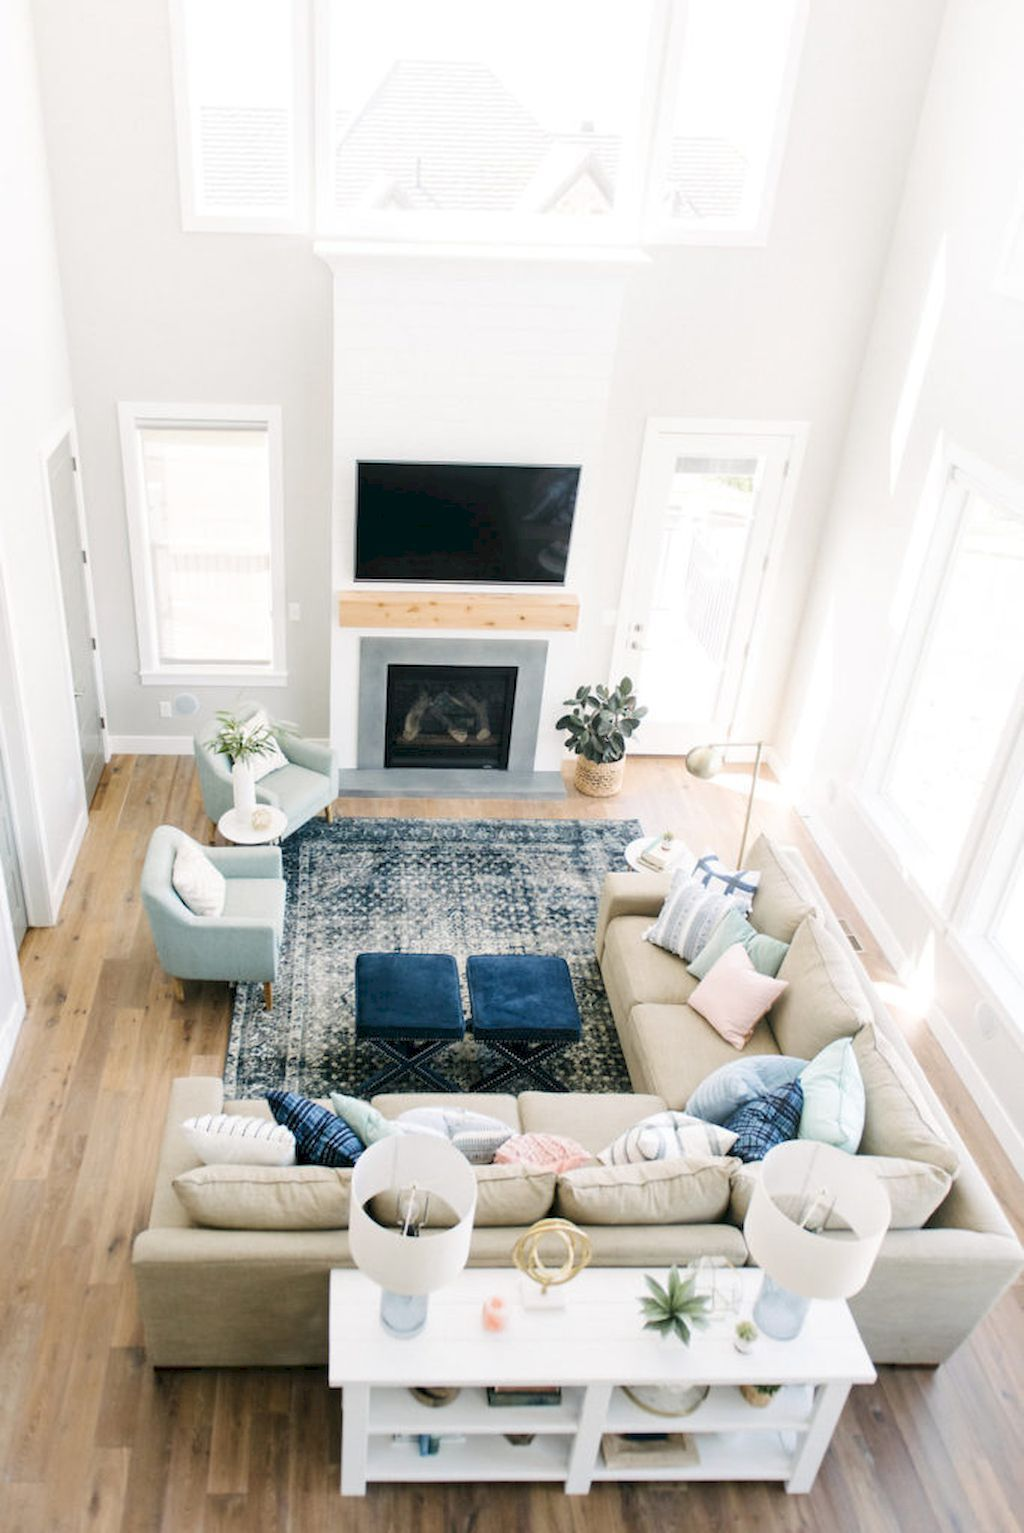 warm and cozy farmhouse style living room decor ideas coastal